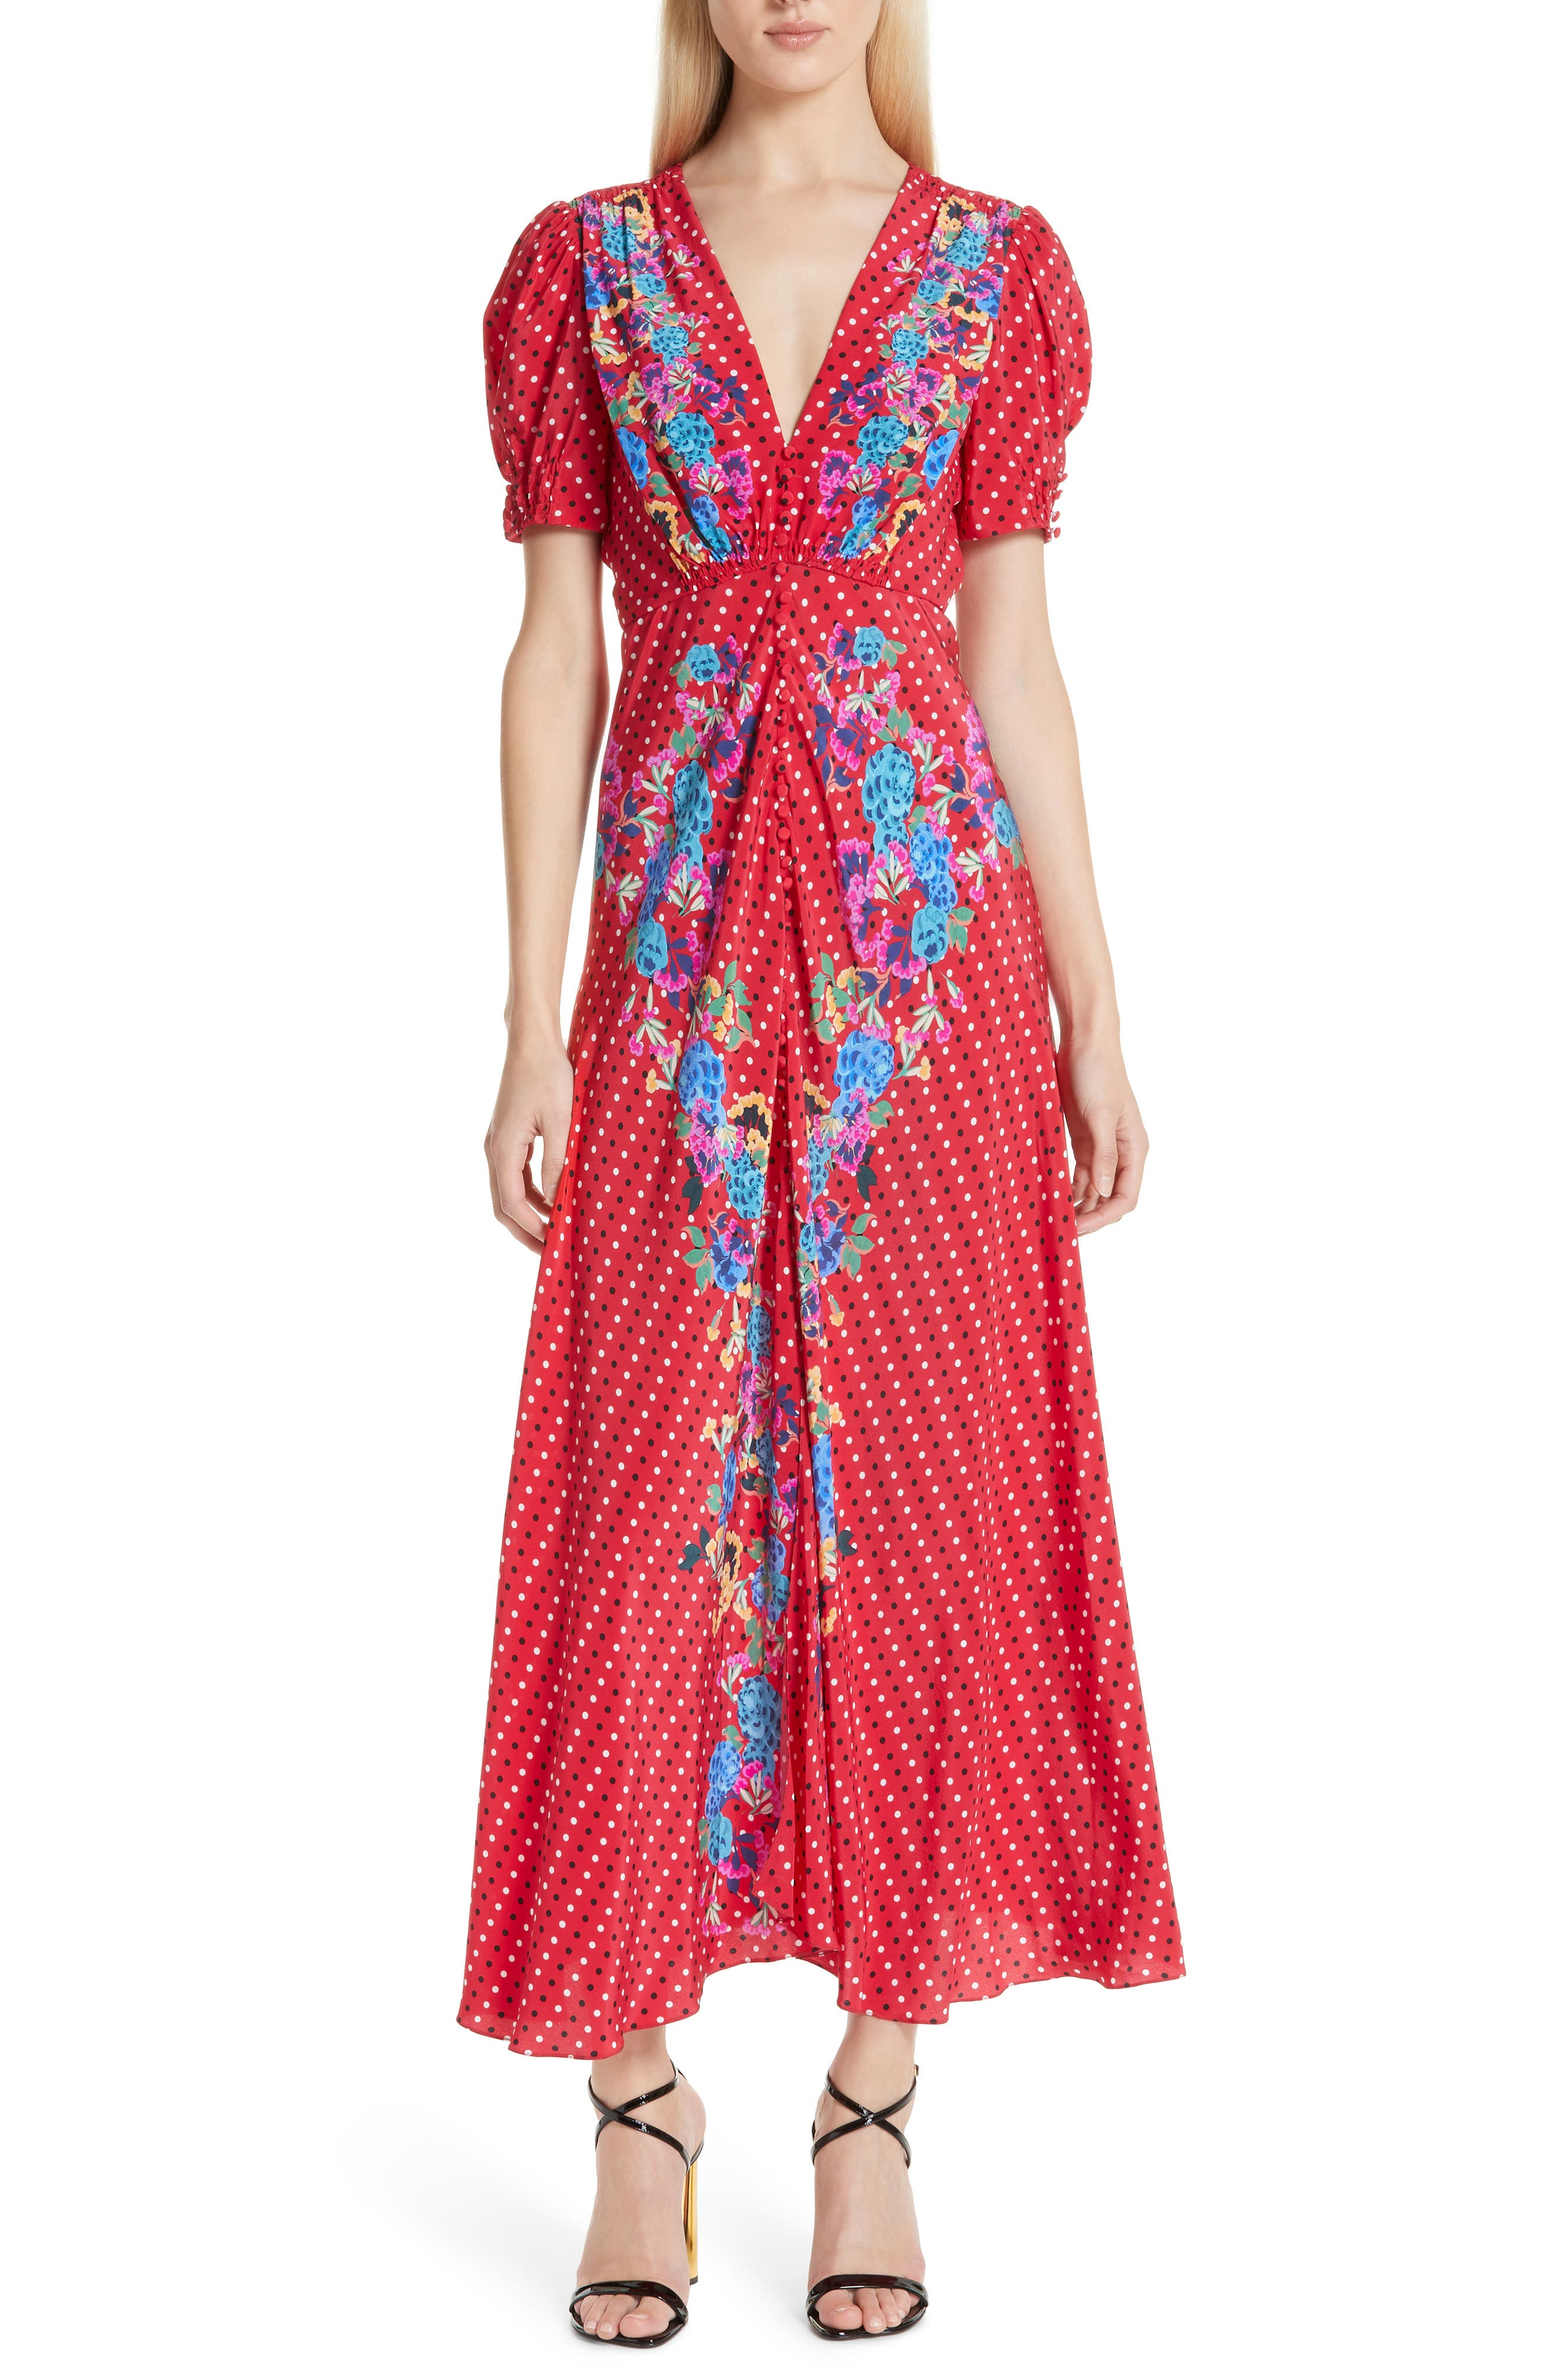 SALONI, Lea Print Silk Maxi Dress, Main thumbnail 1, color, SCARLET POLKA DOT